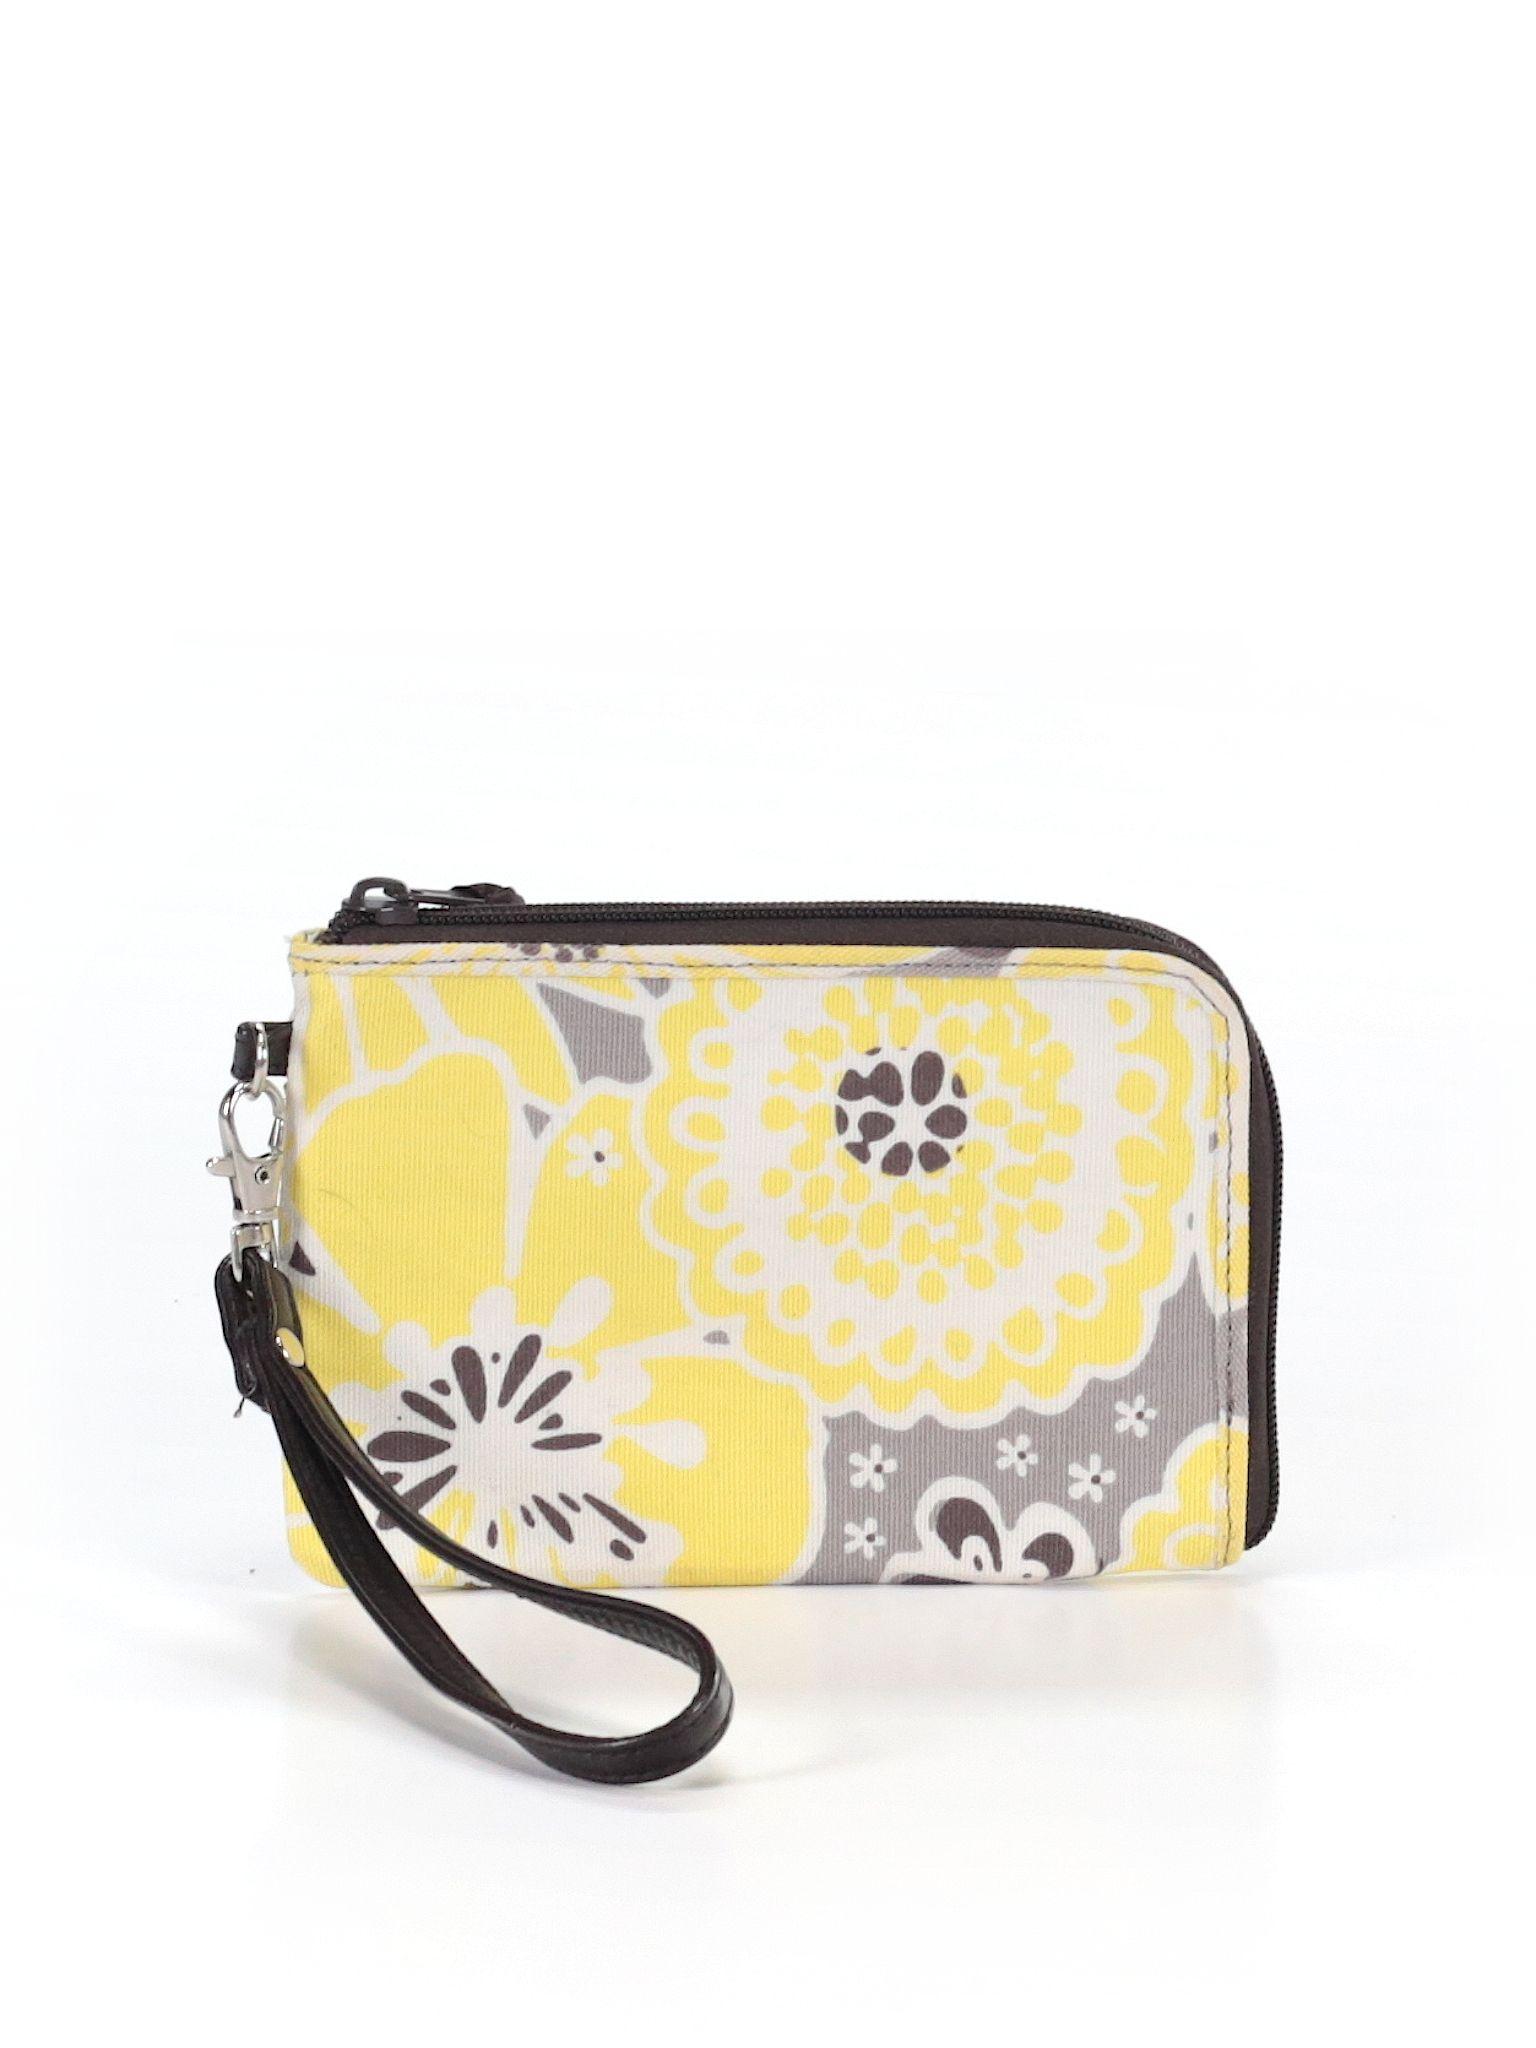 Thirty One Wristlet: Yellow Women\'s Bags - 29840169 | Wristlets ...